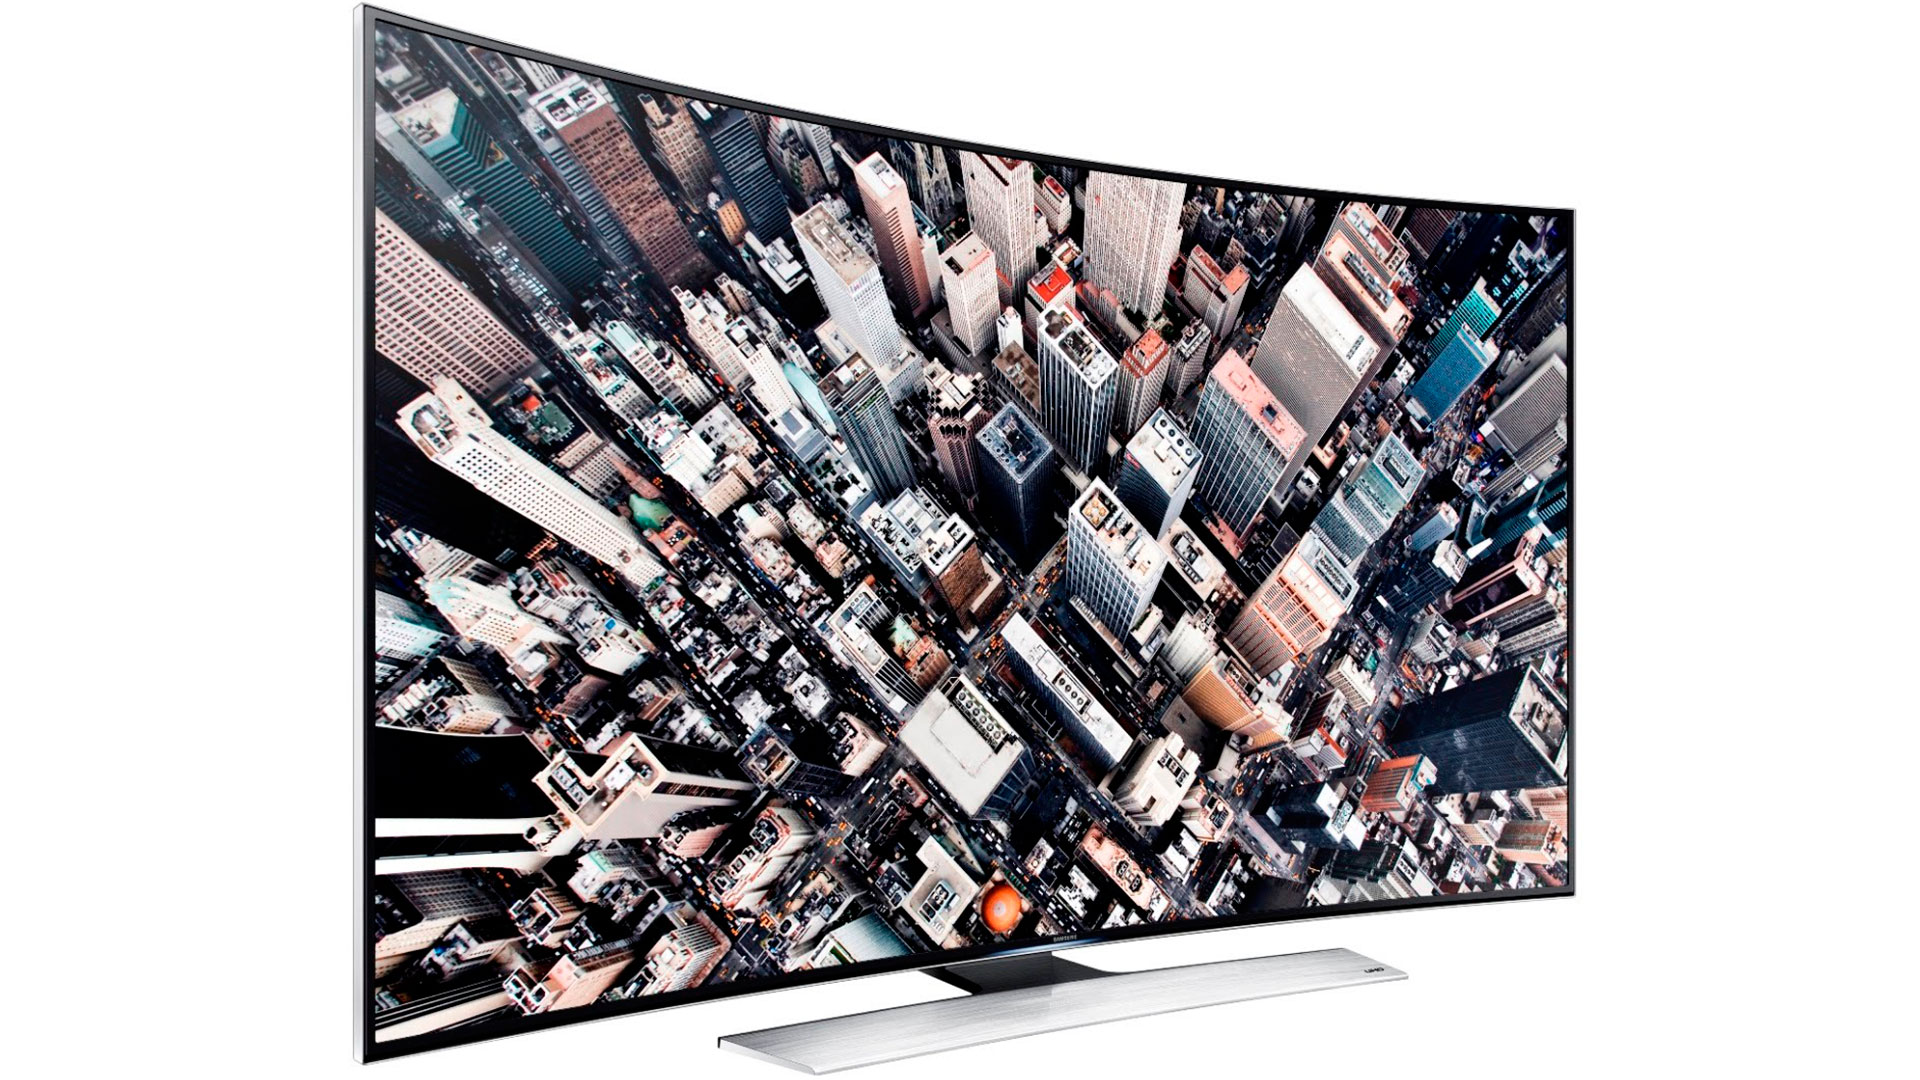 La moda del televisor curvado hero asset